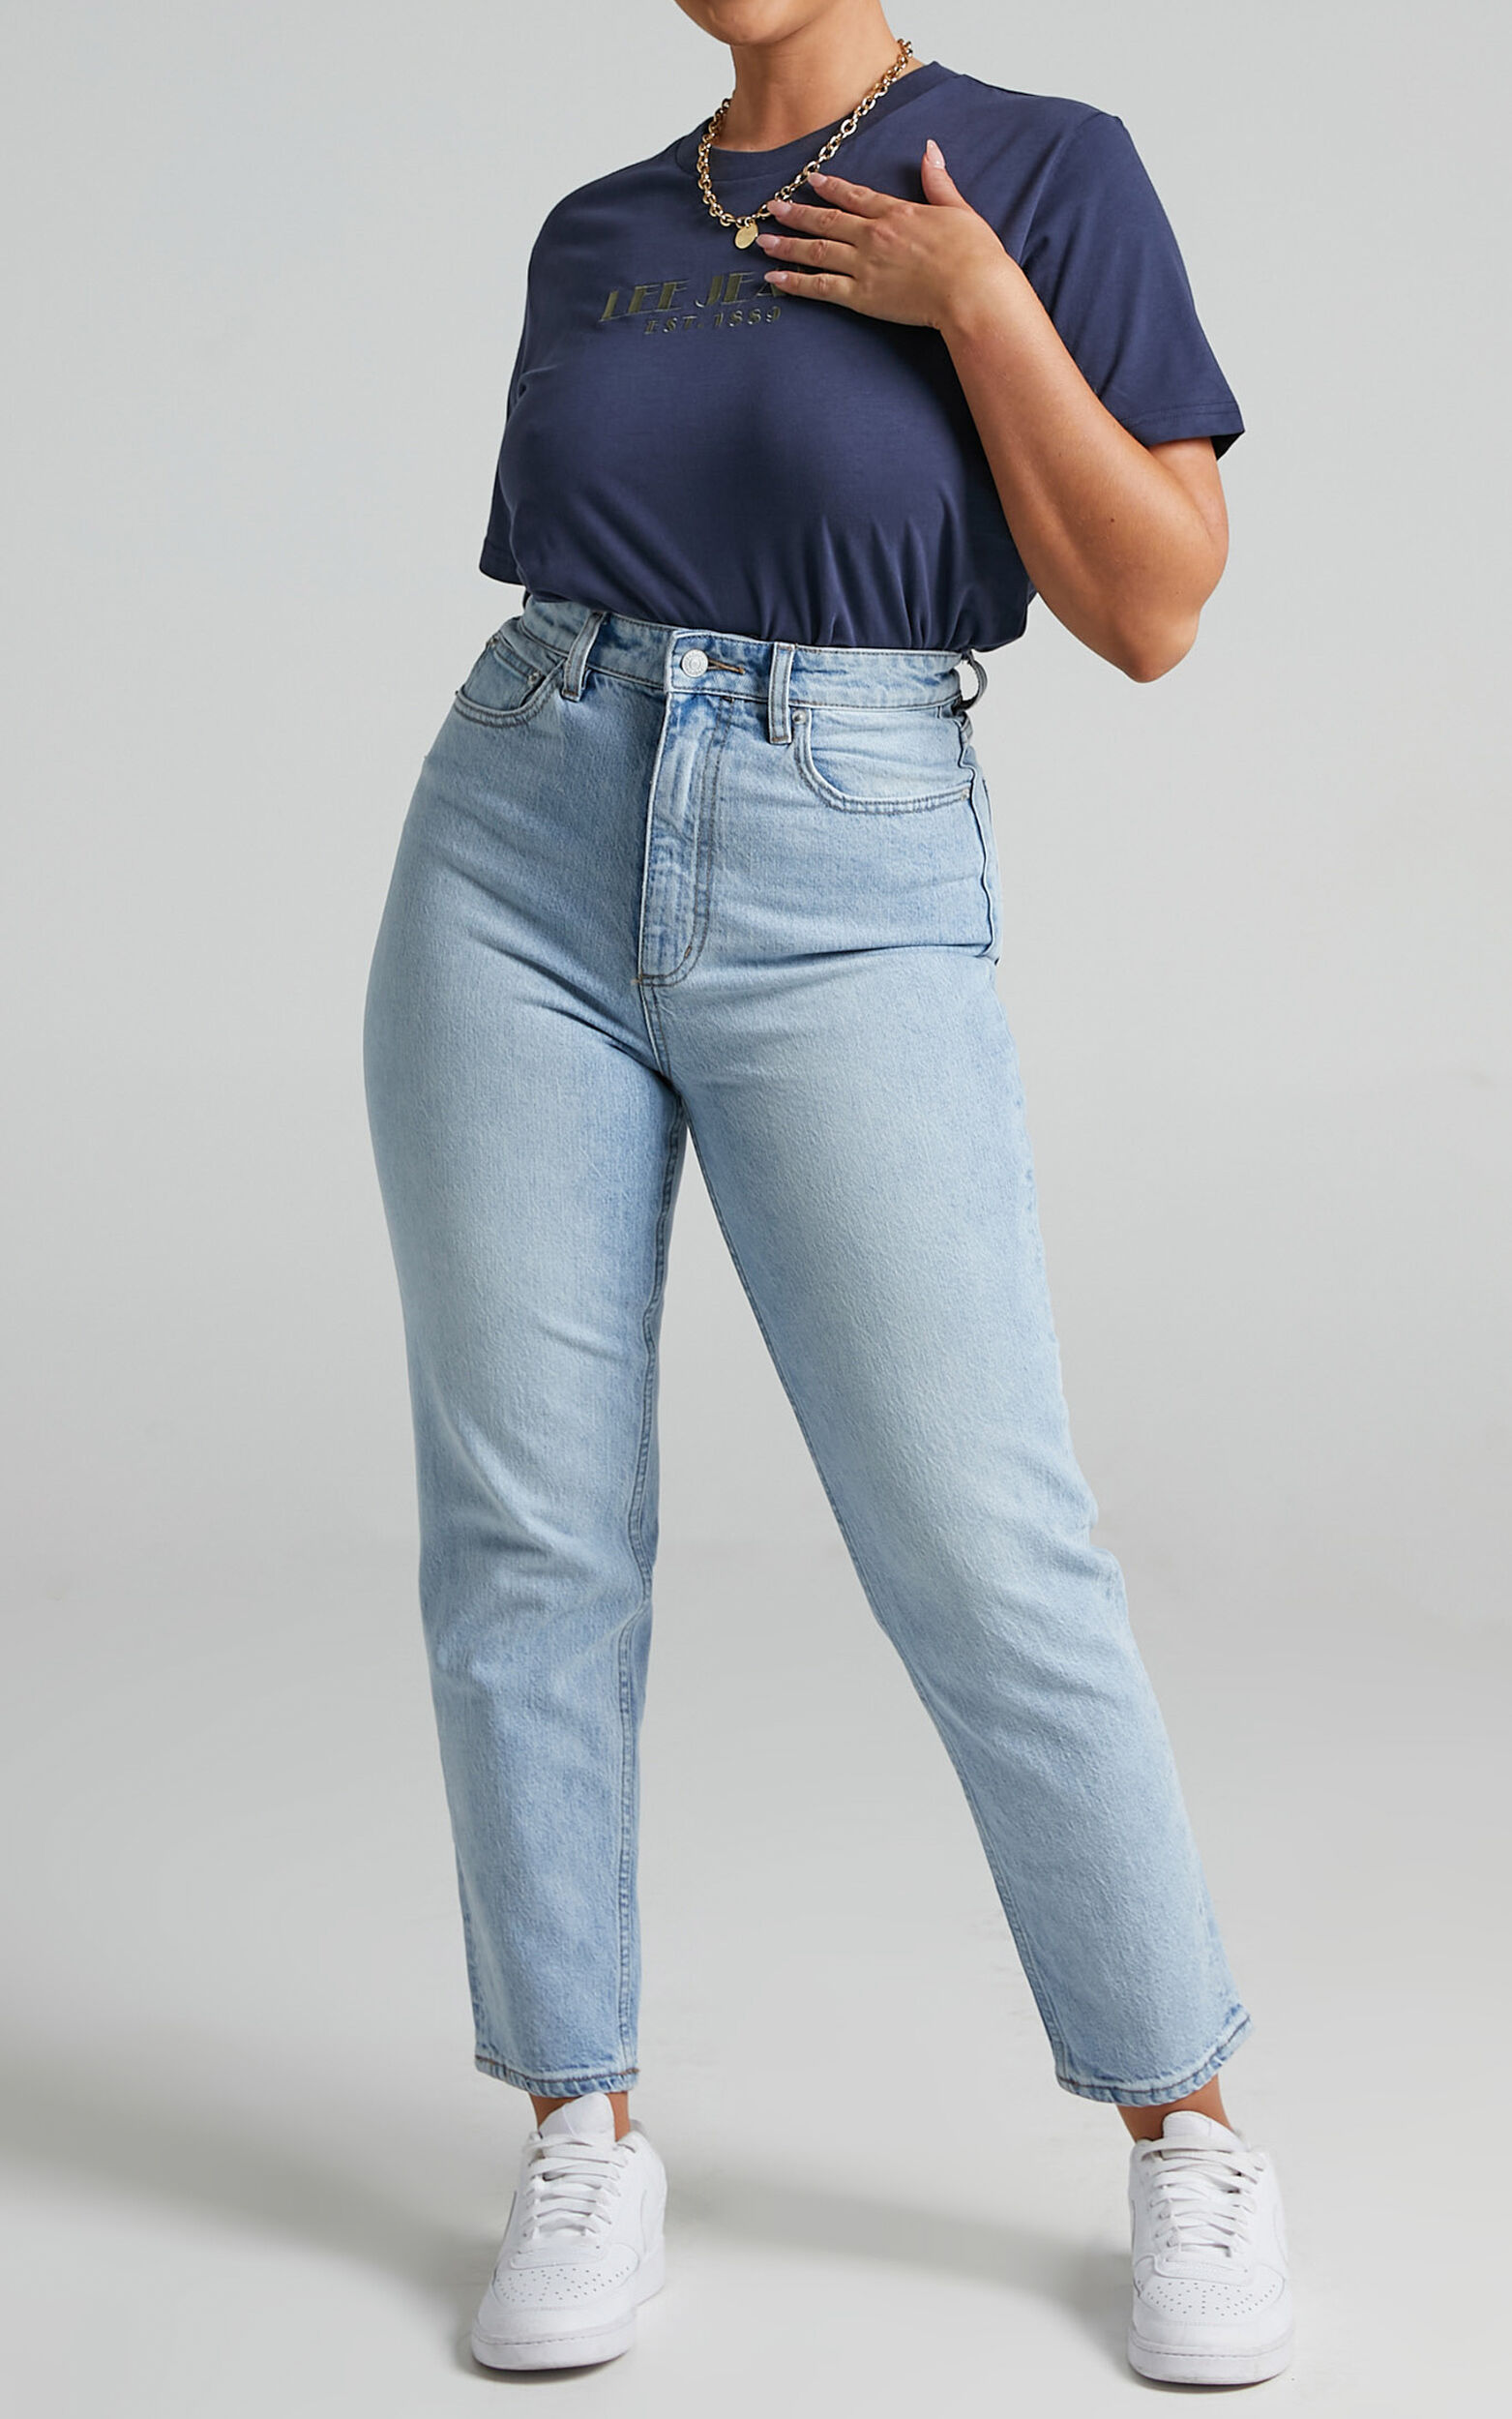 Lee - Hi Mom Jeans in Luminous - 06, BLU1, super-hi-res image number null